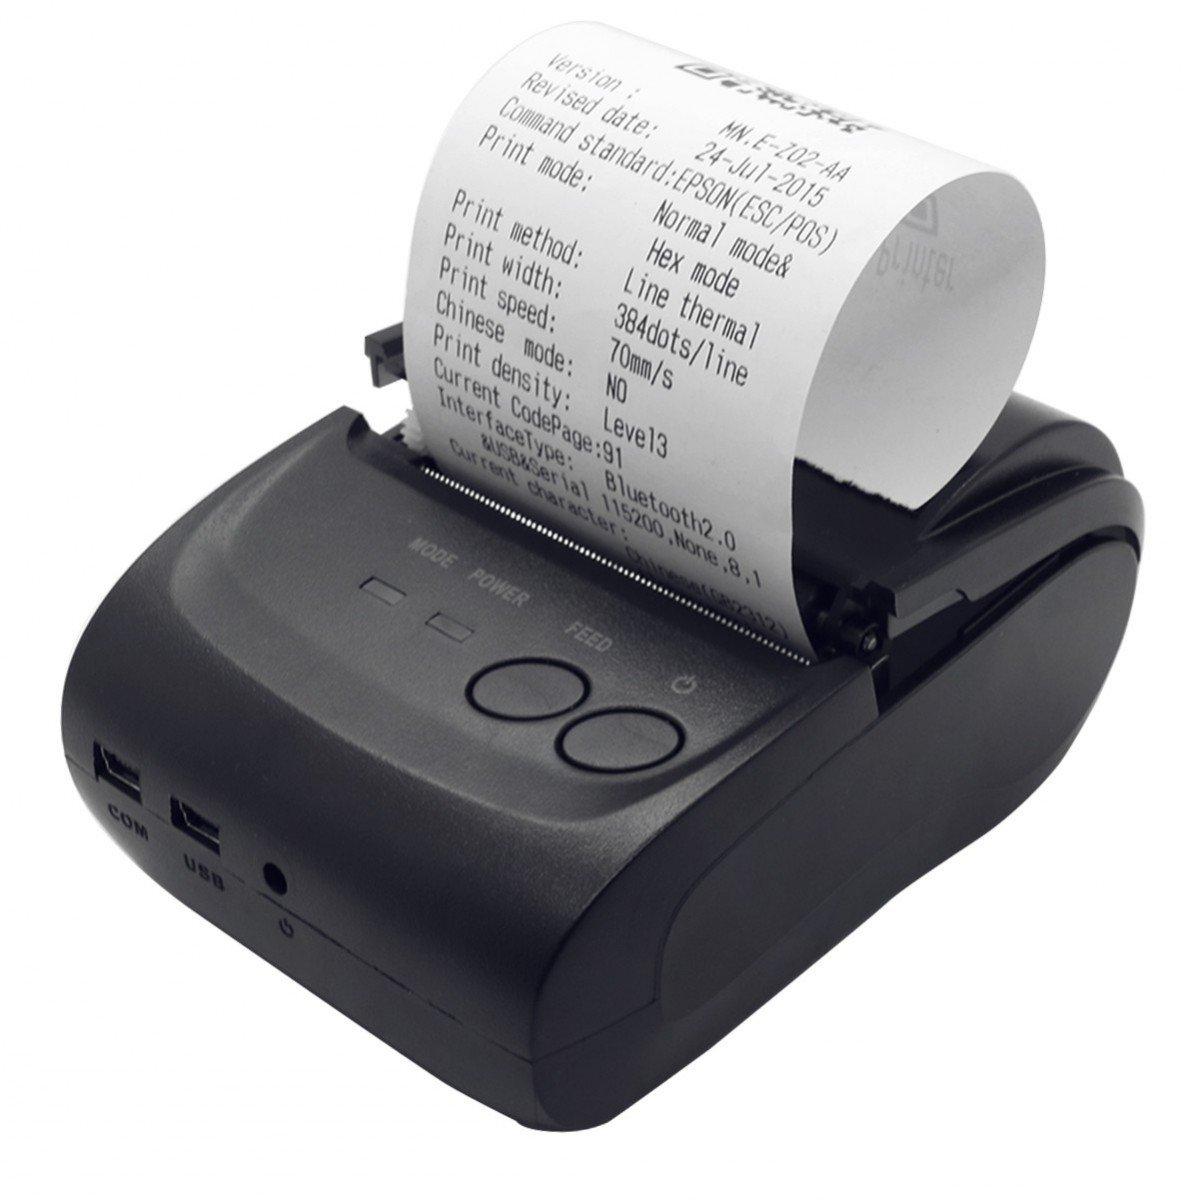 icablelink VOXLINK Mini Impresora Térmica Bluetooth de ...